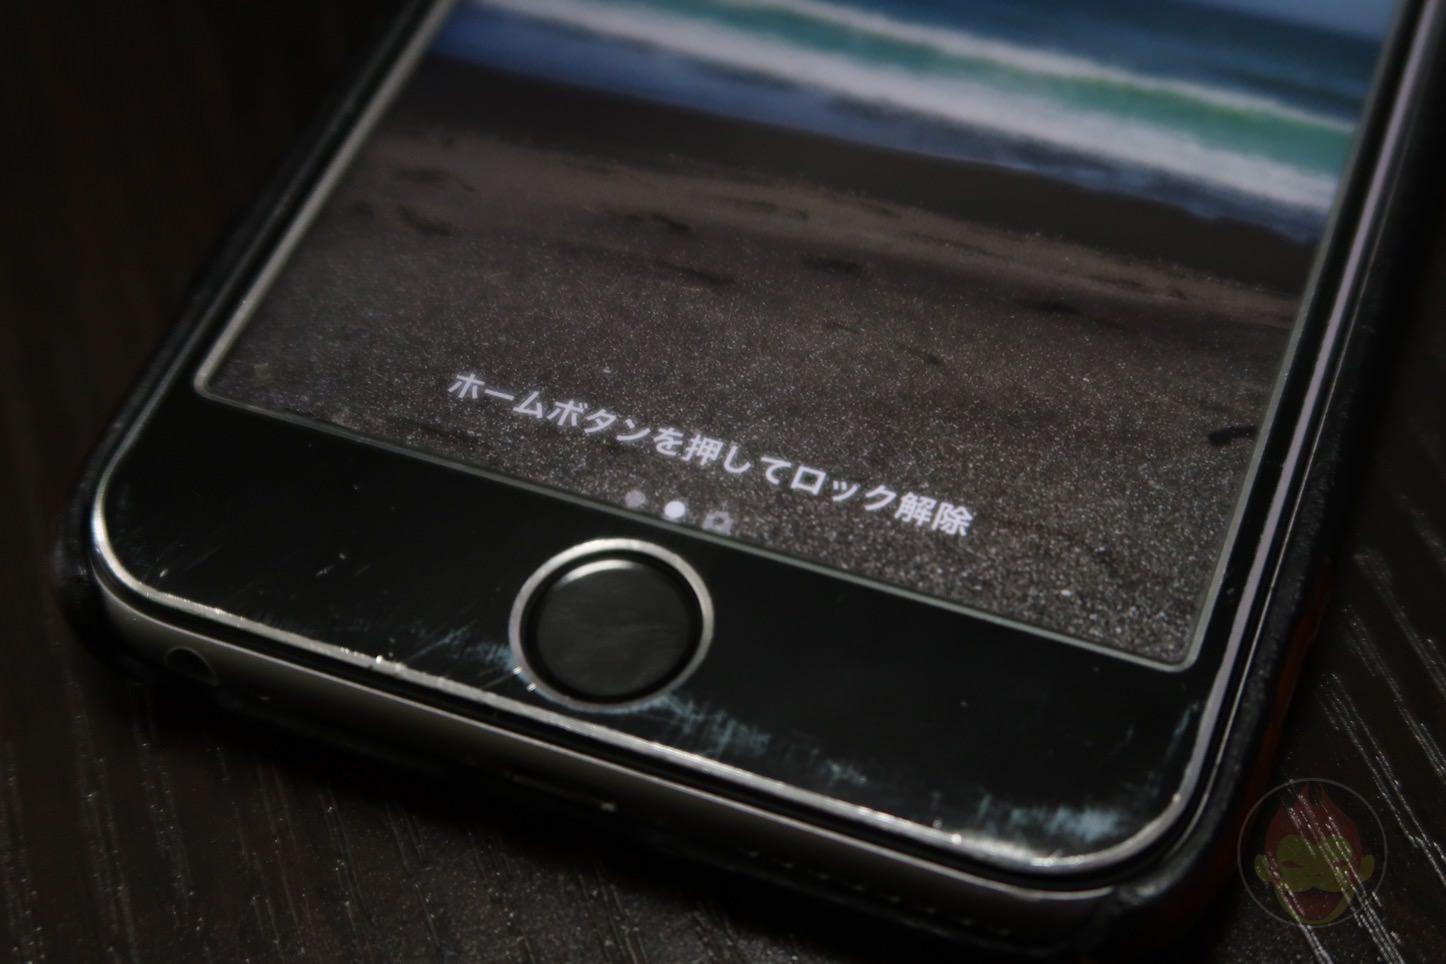 Press-Home-Button-to-Unlock-01.JPG